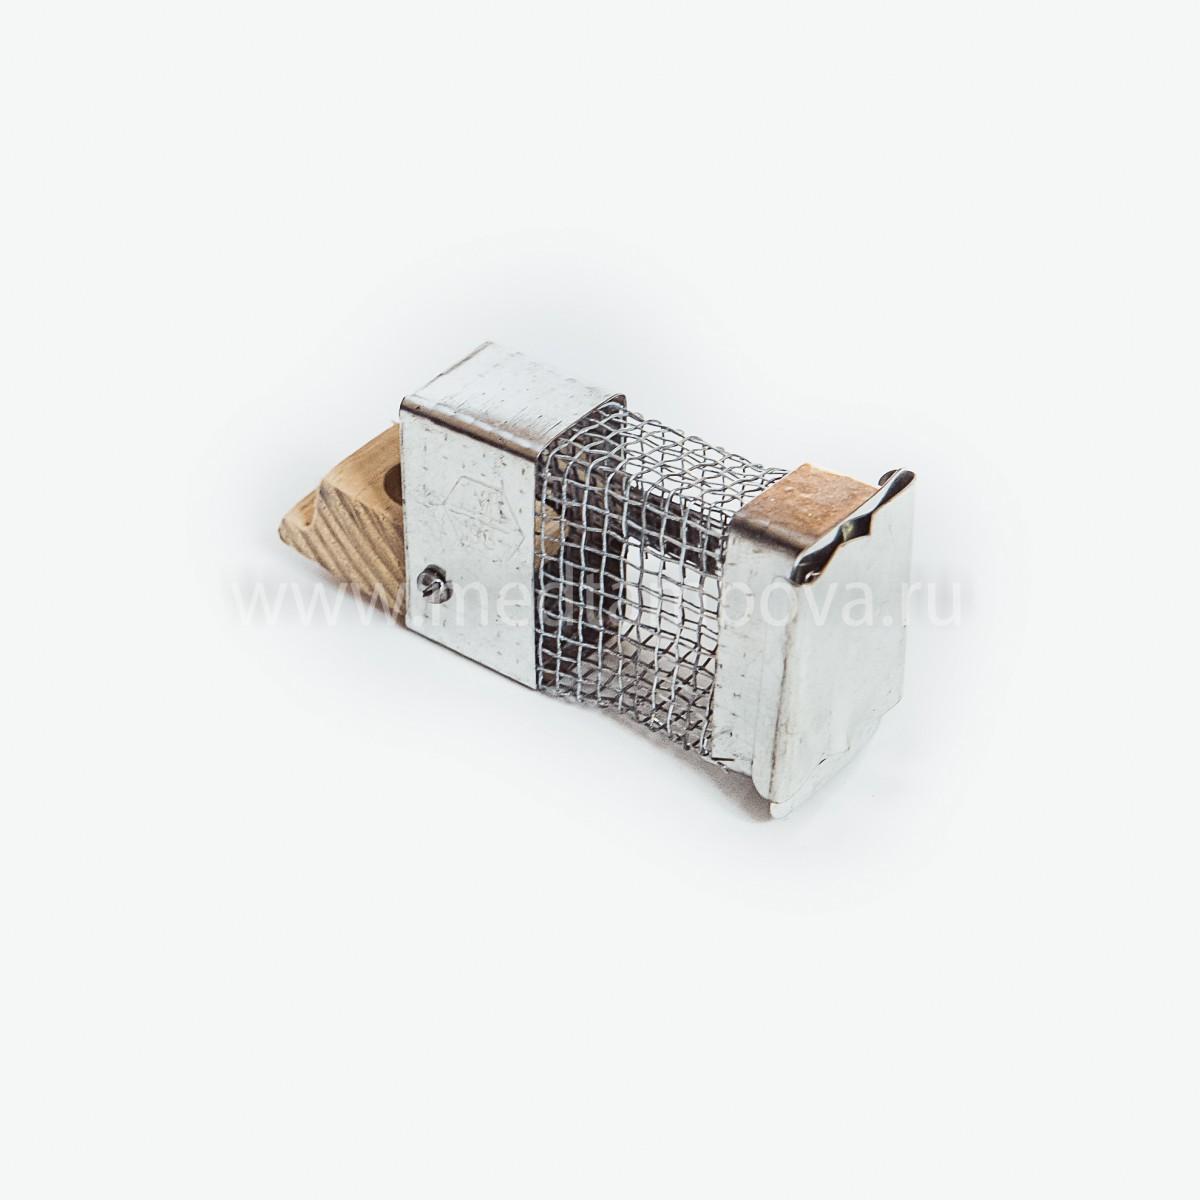 Клеточка Титова из оцинковки (метал/дерево)